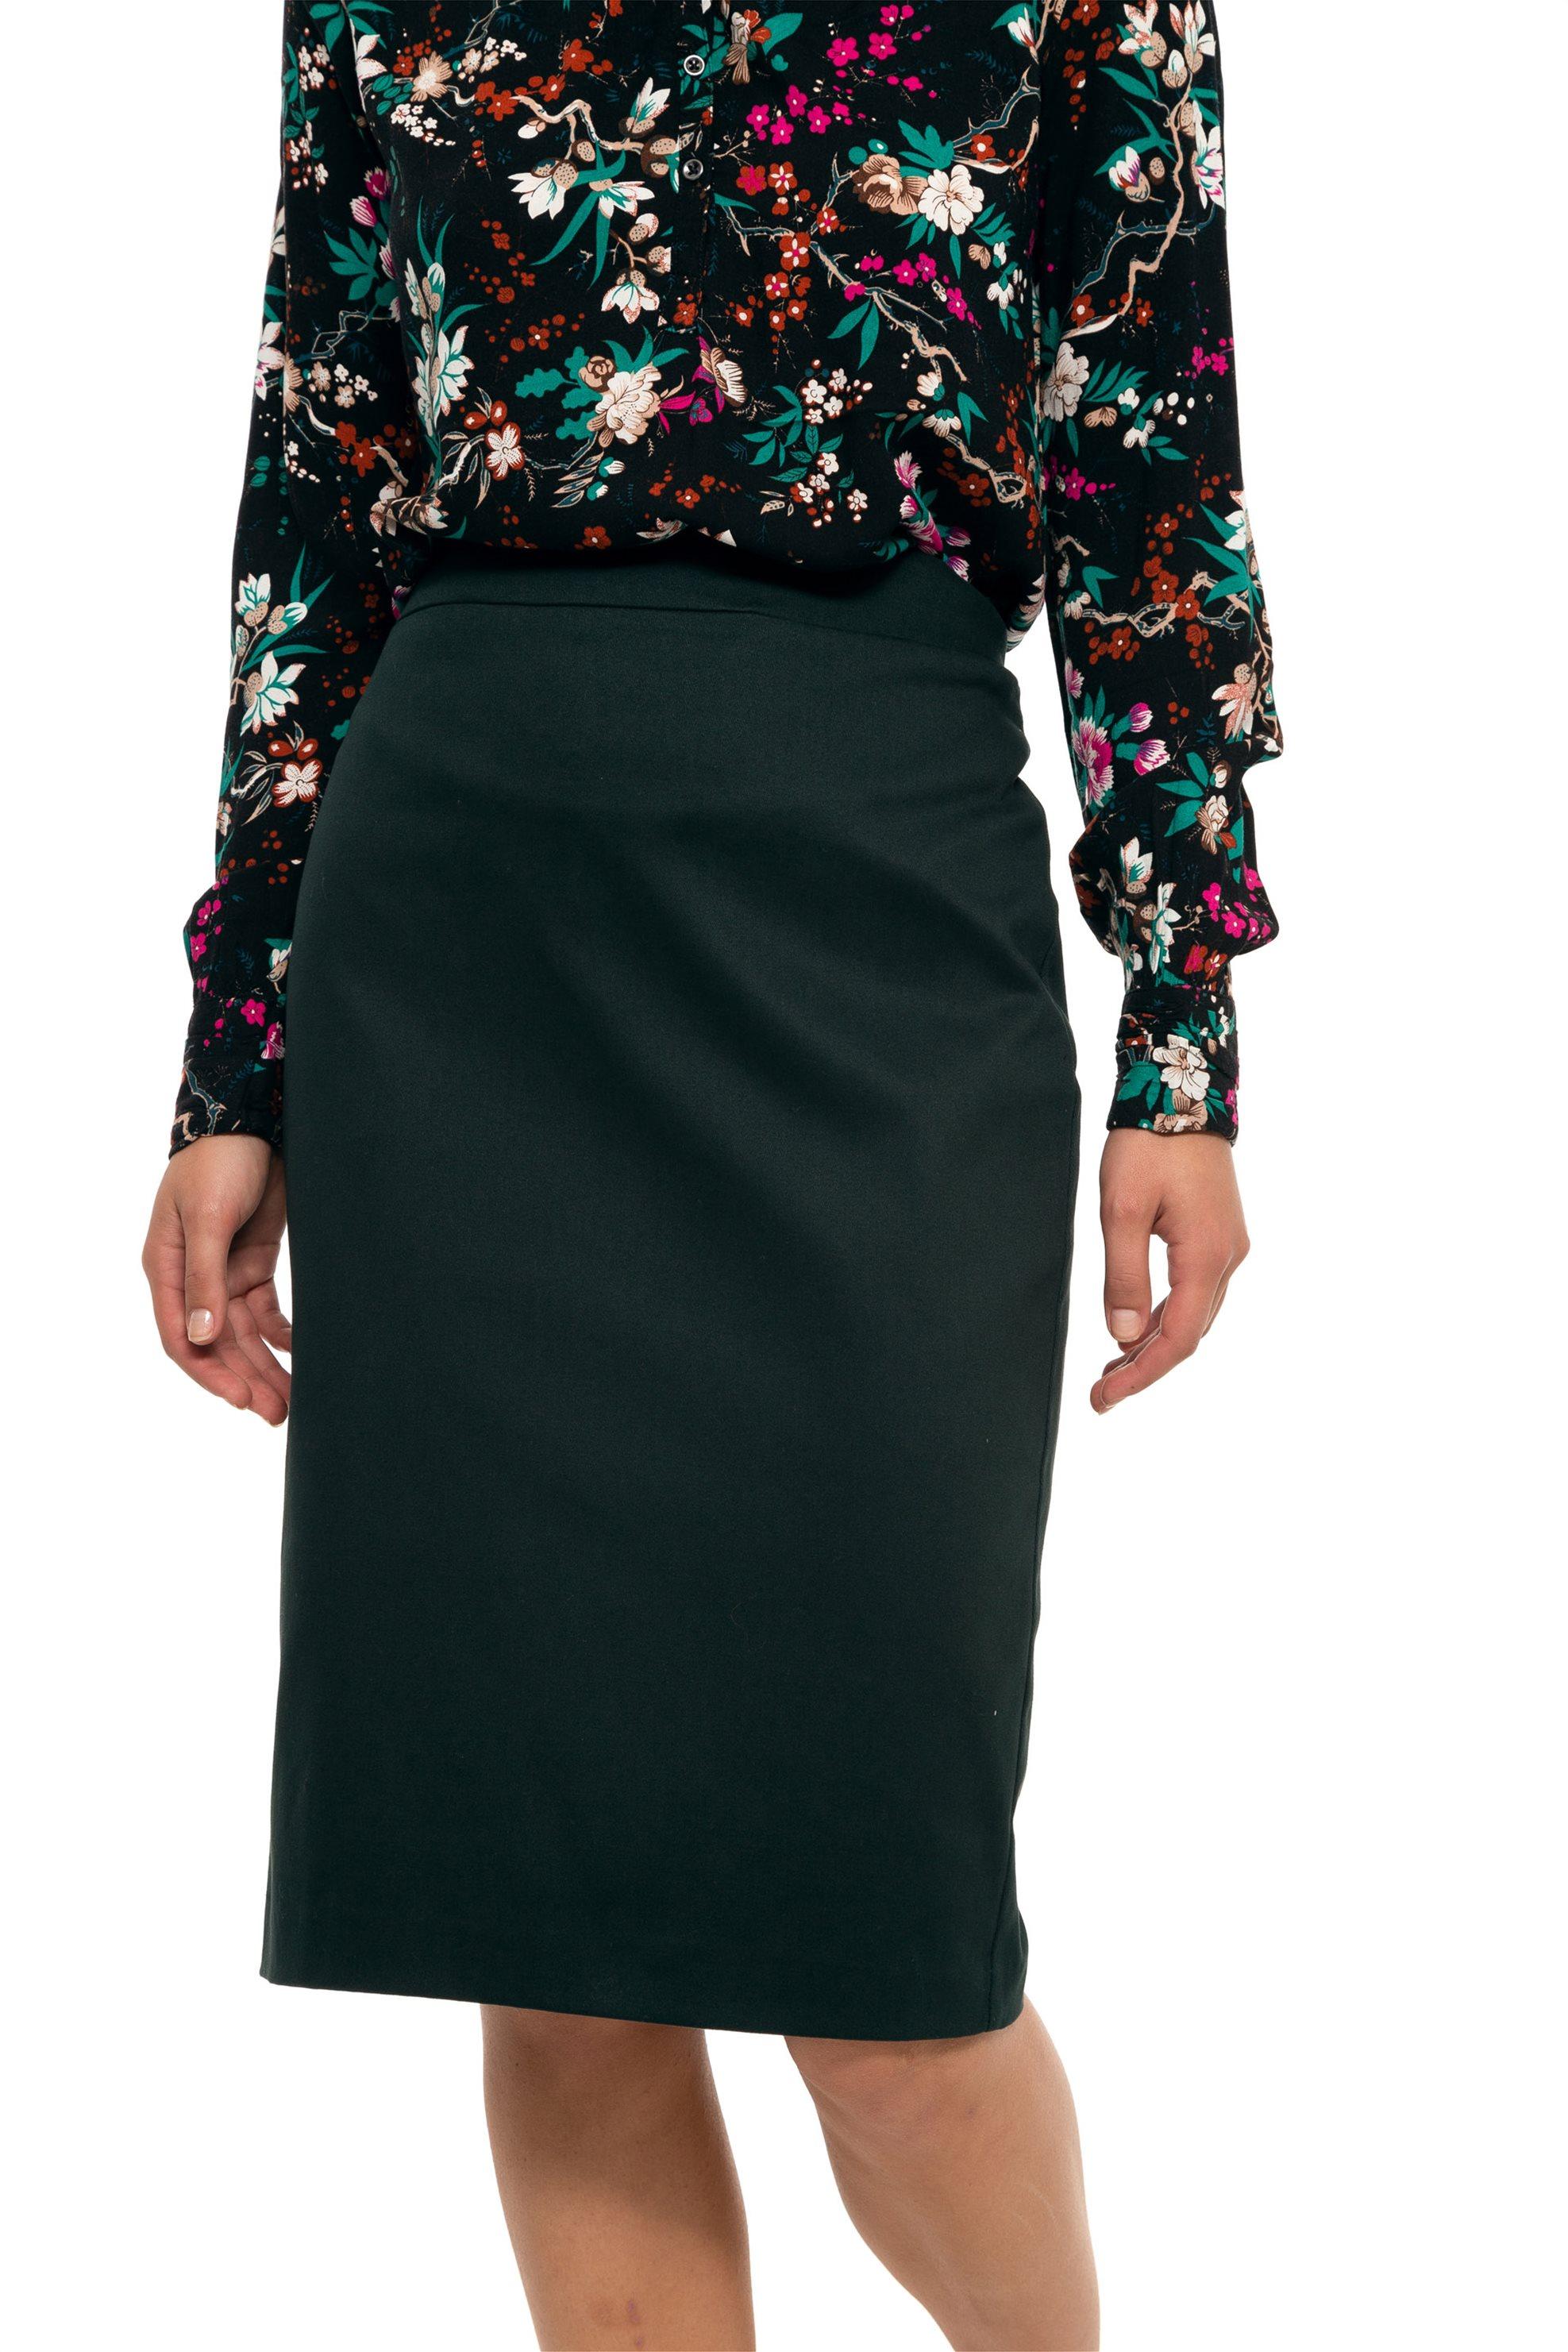 Paul Christophe γυναικεία φούστα pencil ψηλόμεση - 832109 - Κυπαρισσί γυναικα   ρουχα   φούστες   pencil